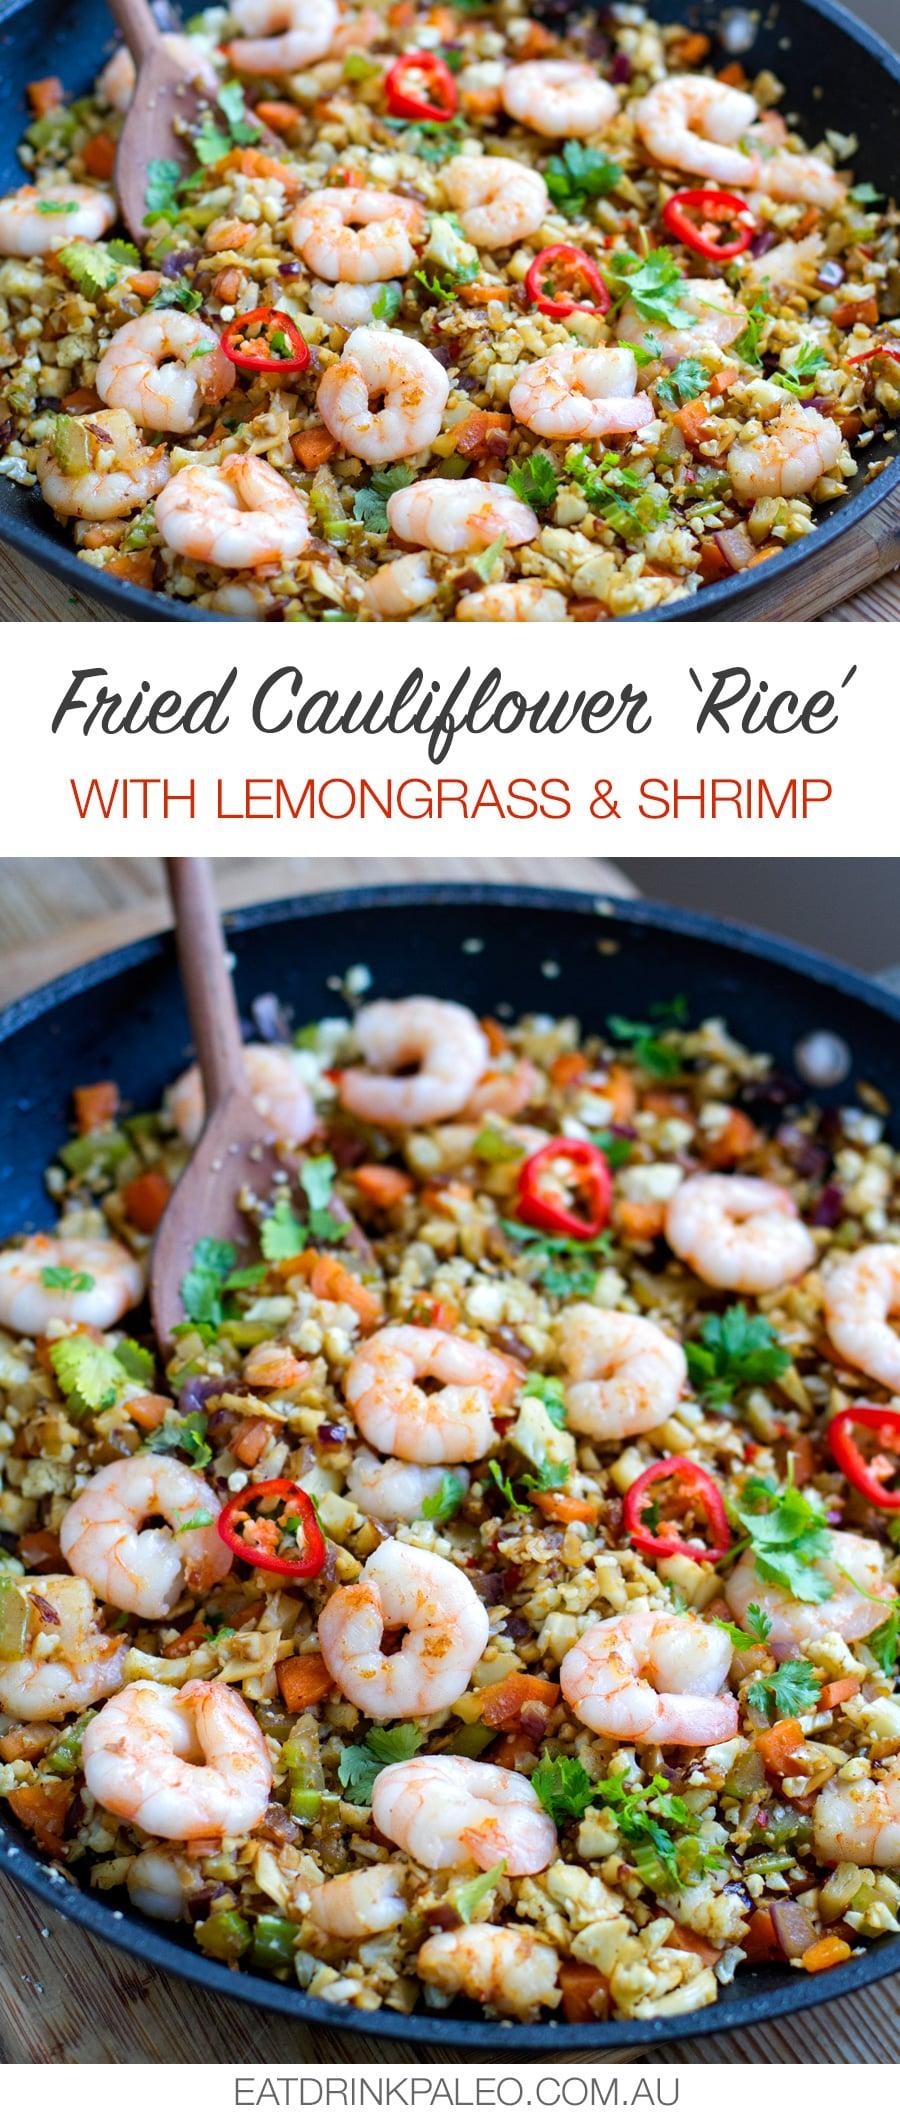 Lemongrass Cauliflower Shrimp Fried Rice (Paleo, Keto, Whole30)